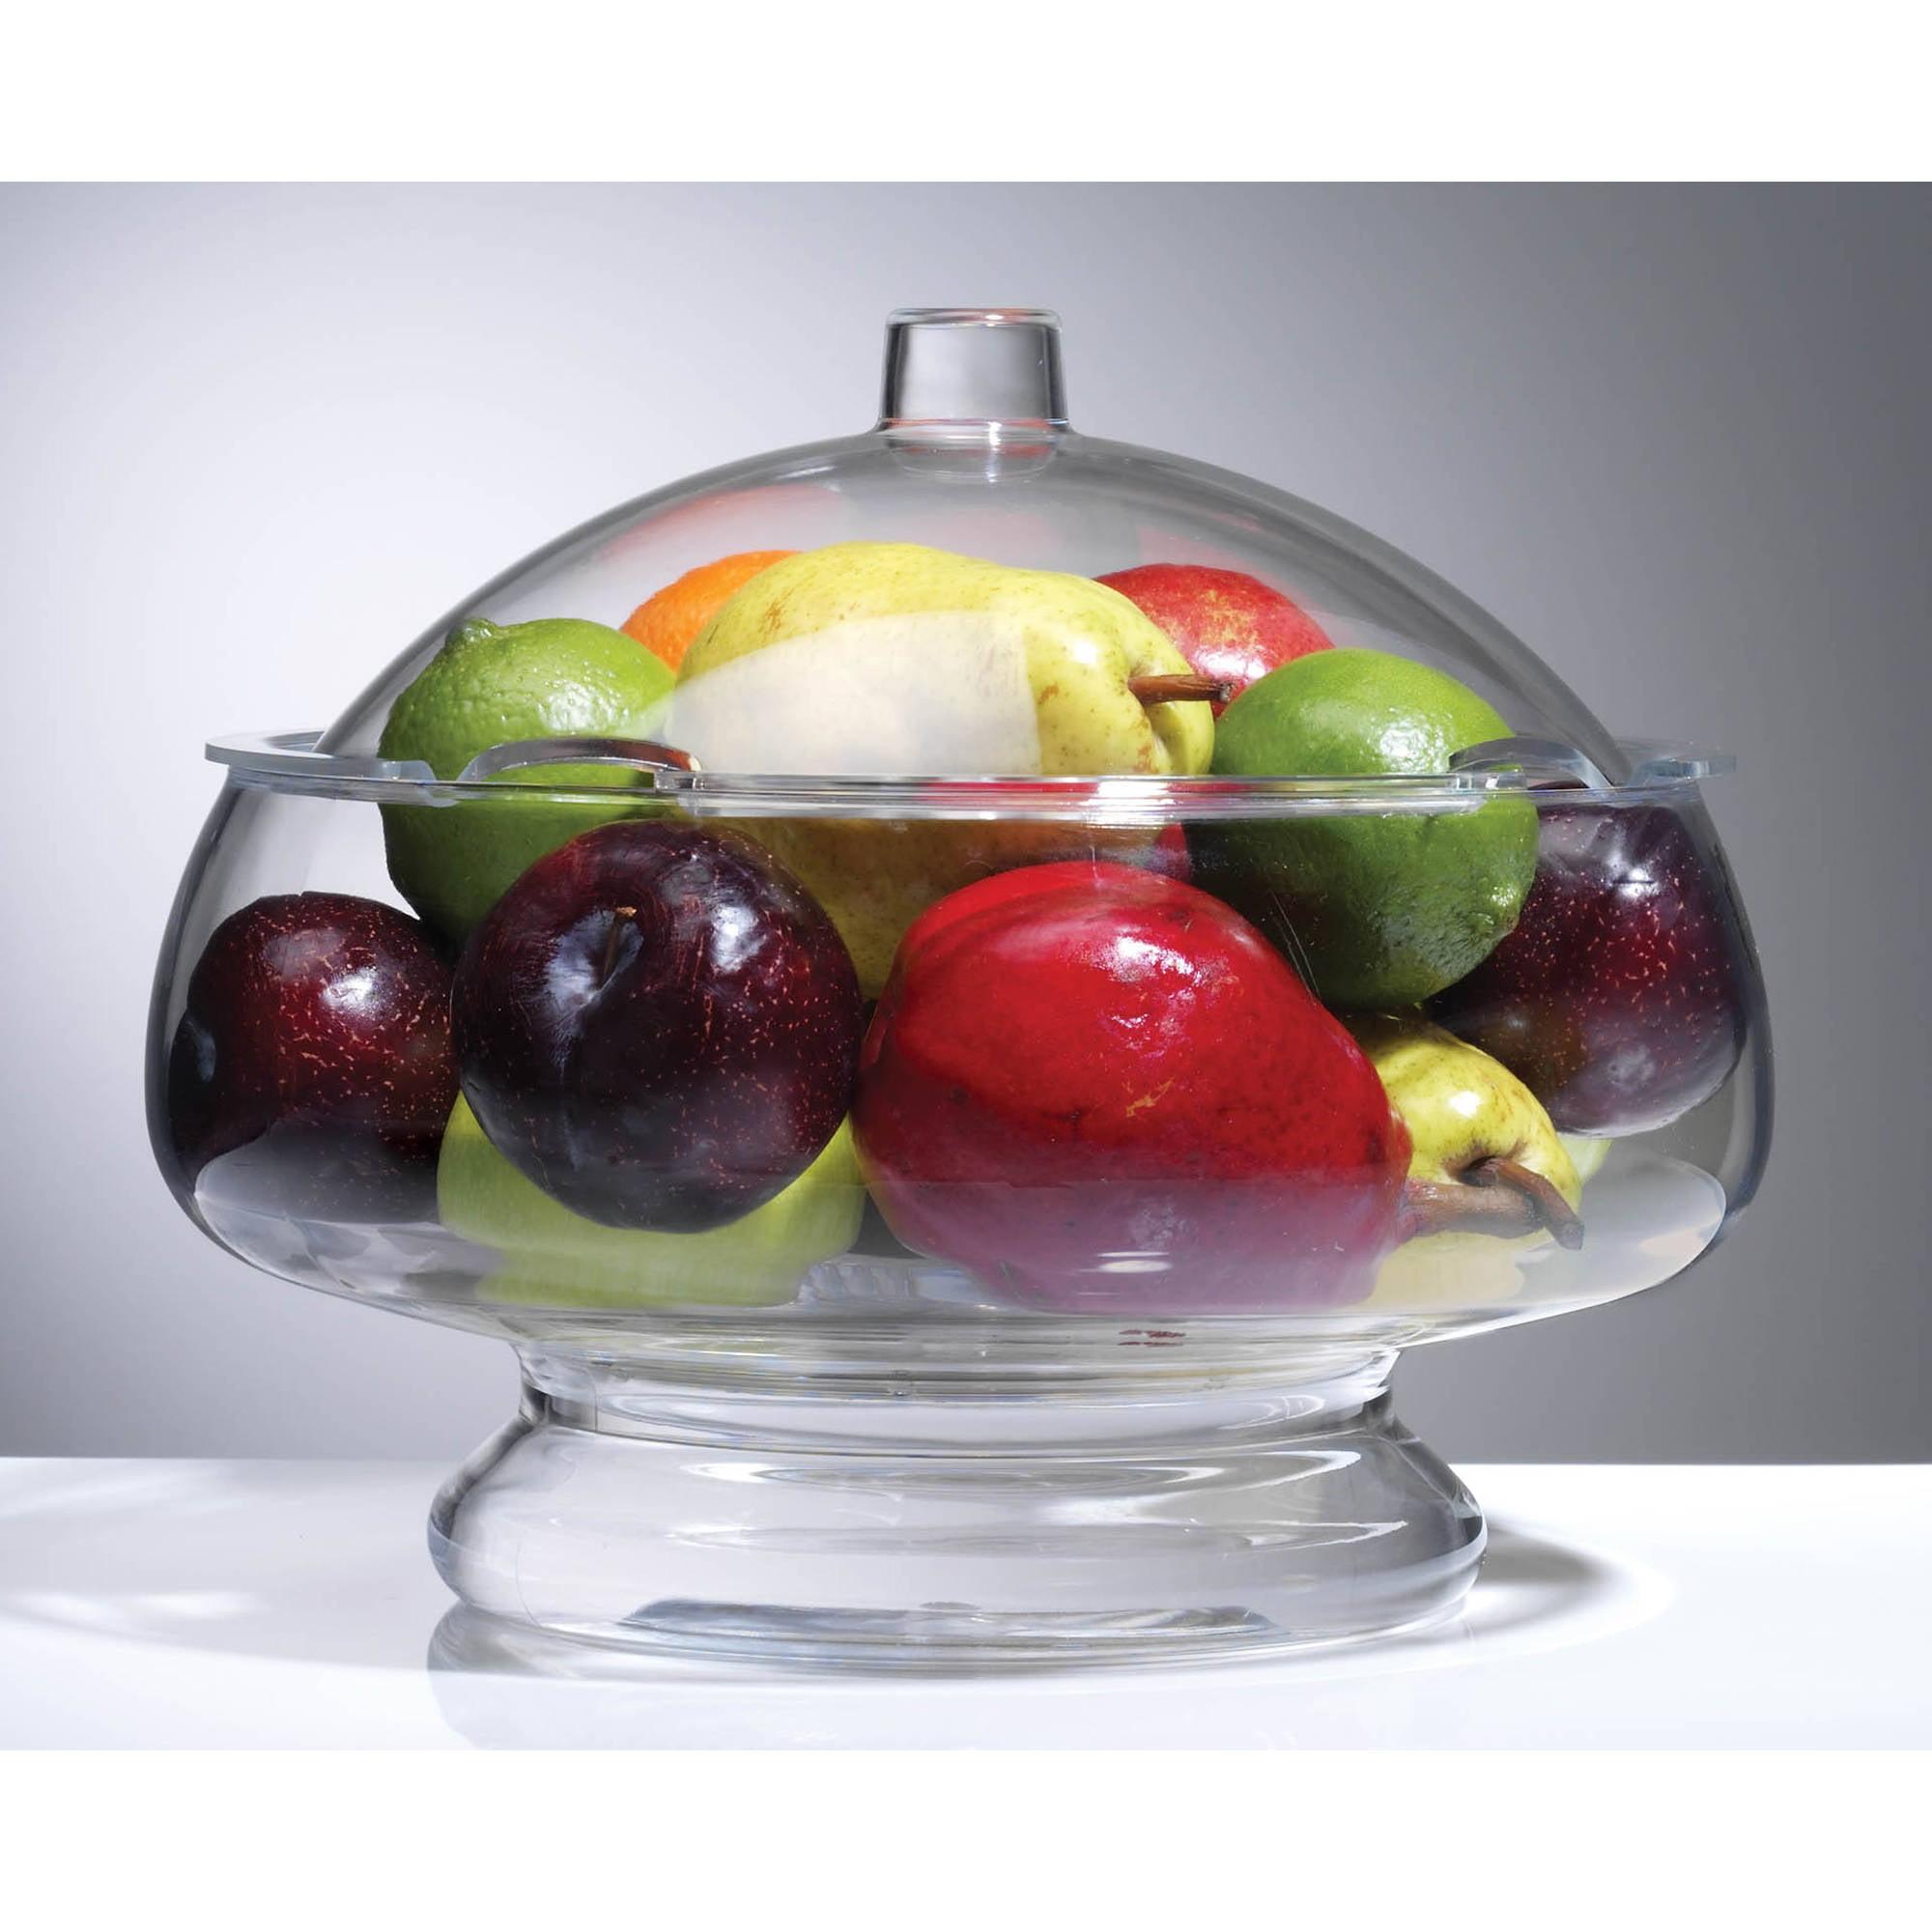 Prodyne Salad On Ice Acrylic with Dome Lid